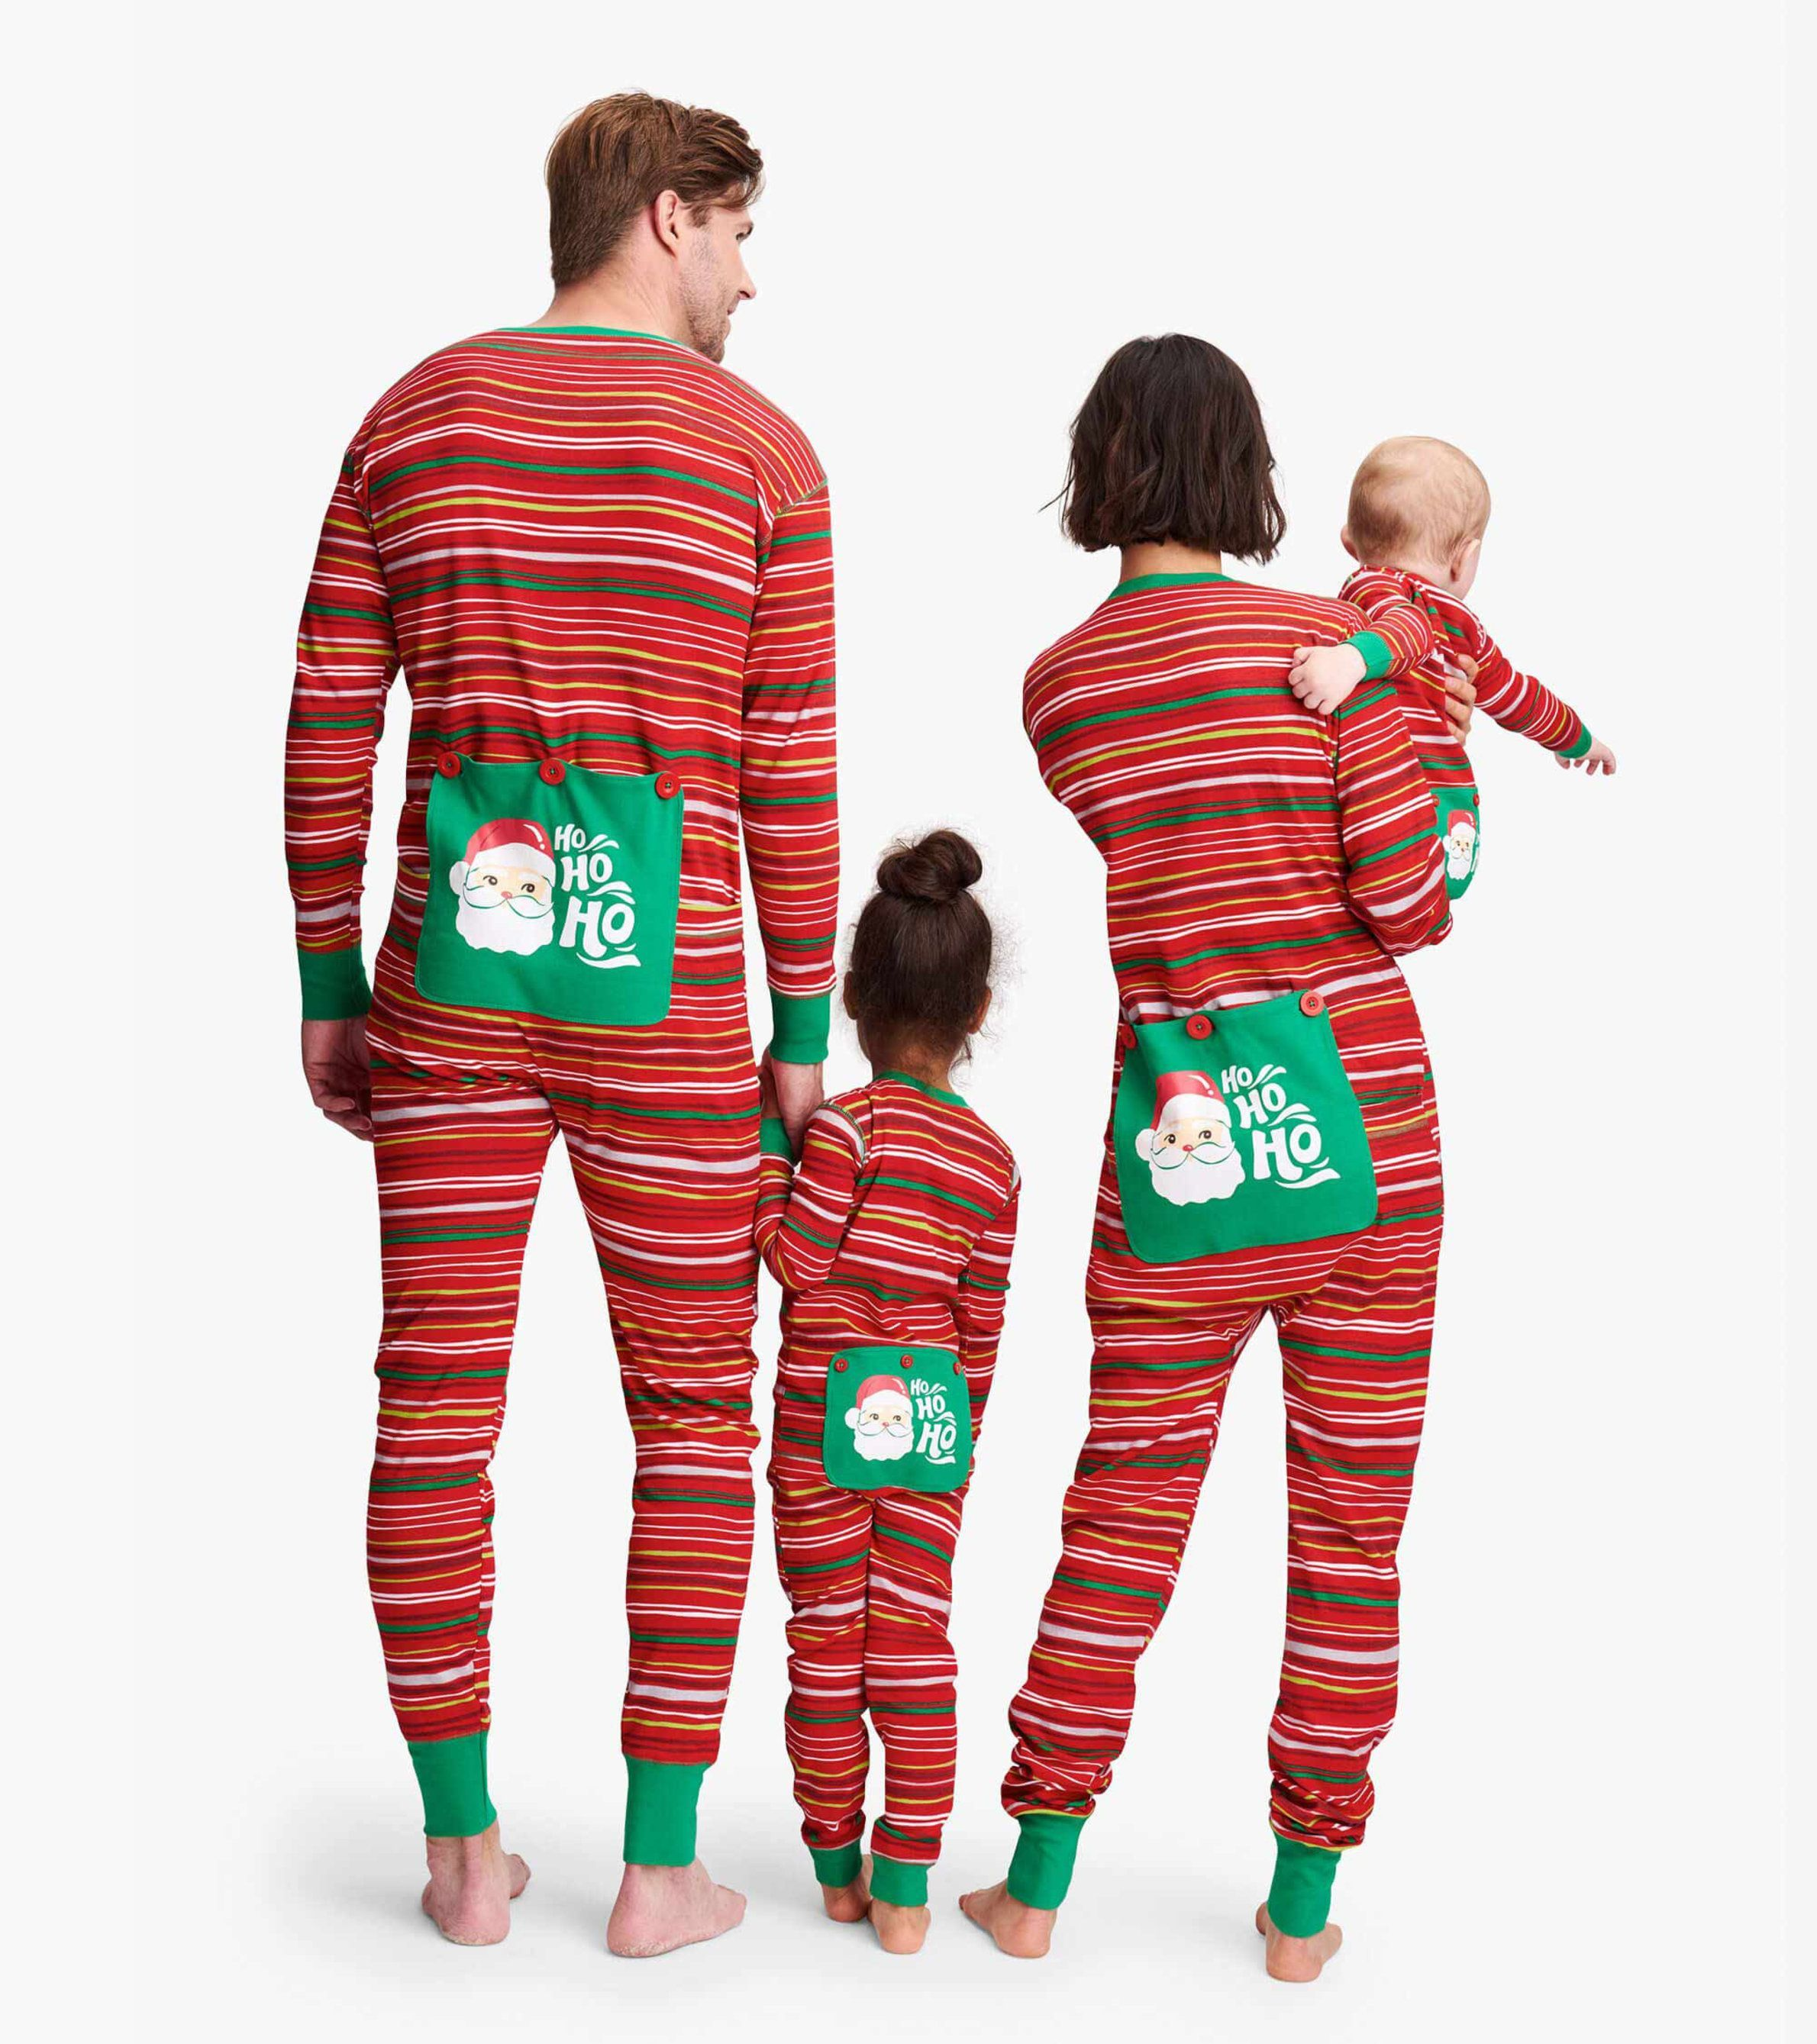 Seogva Christmas Suit Pajamas Christmas Family Matching Sets Sleepwear Family Long Sleeve Set pjs,Red